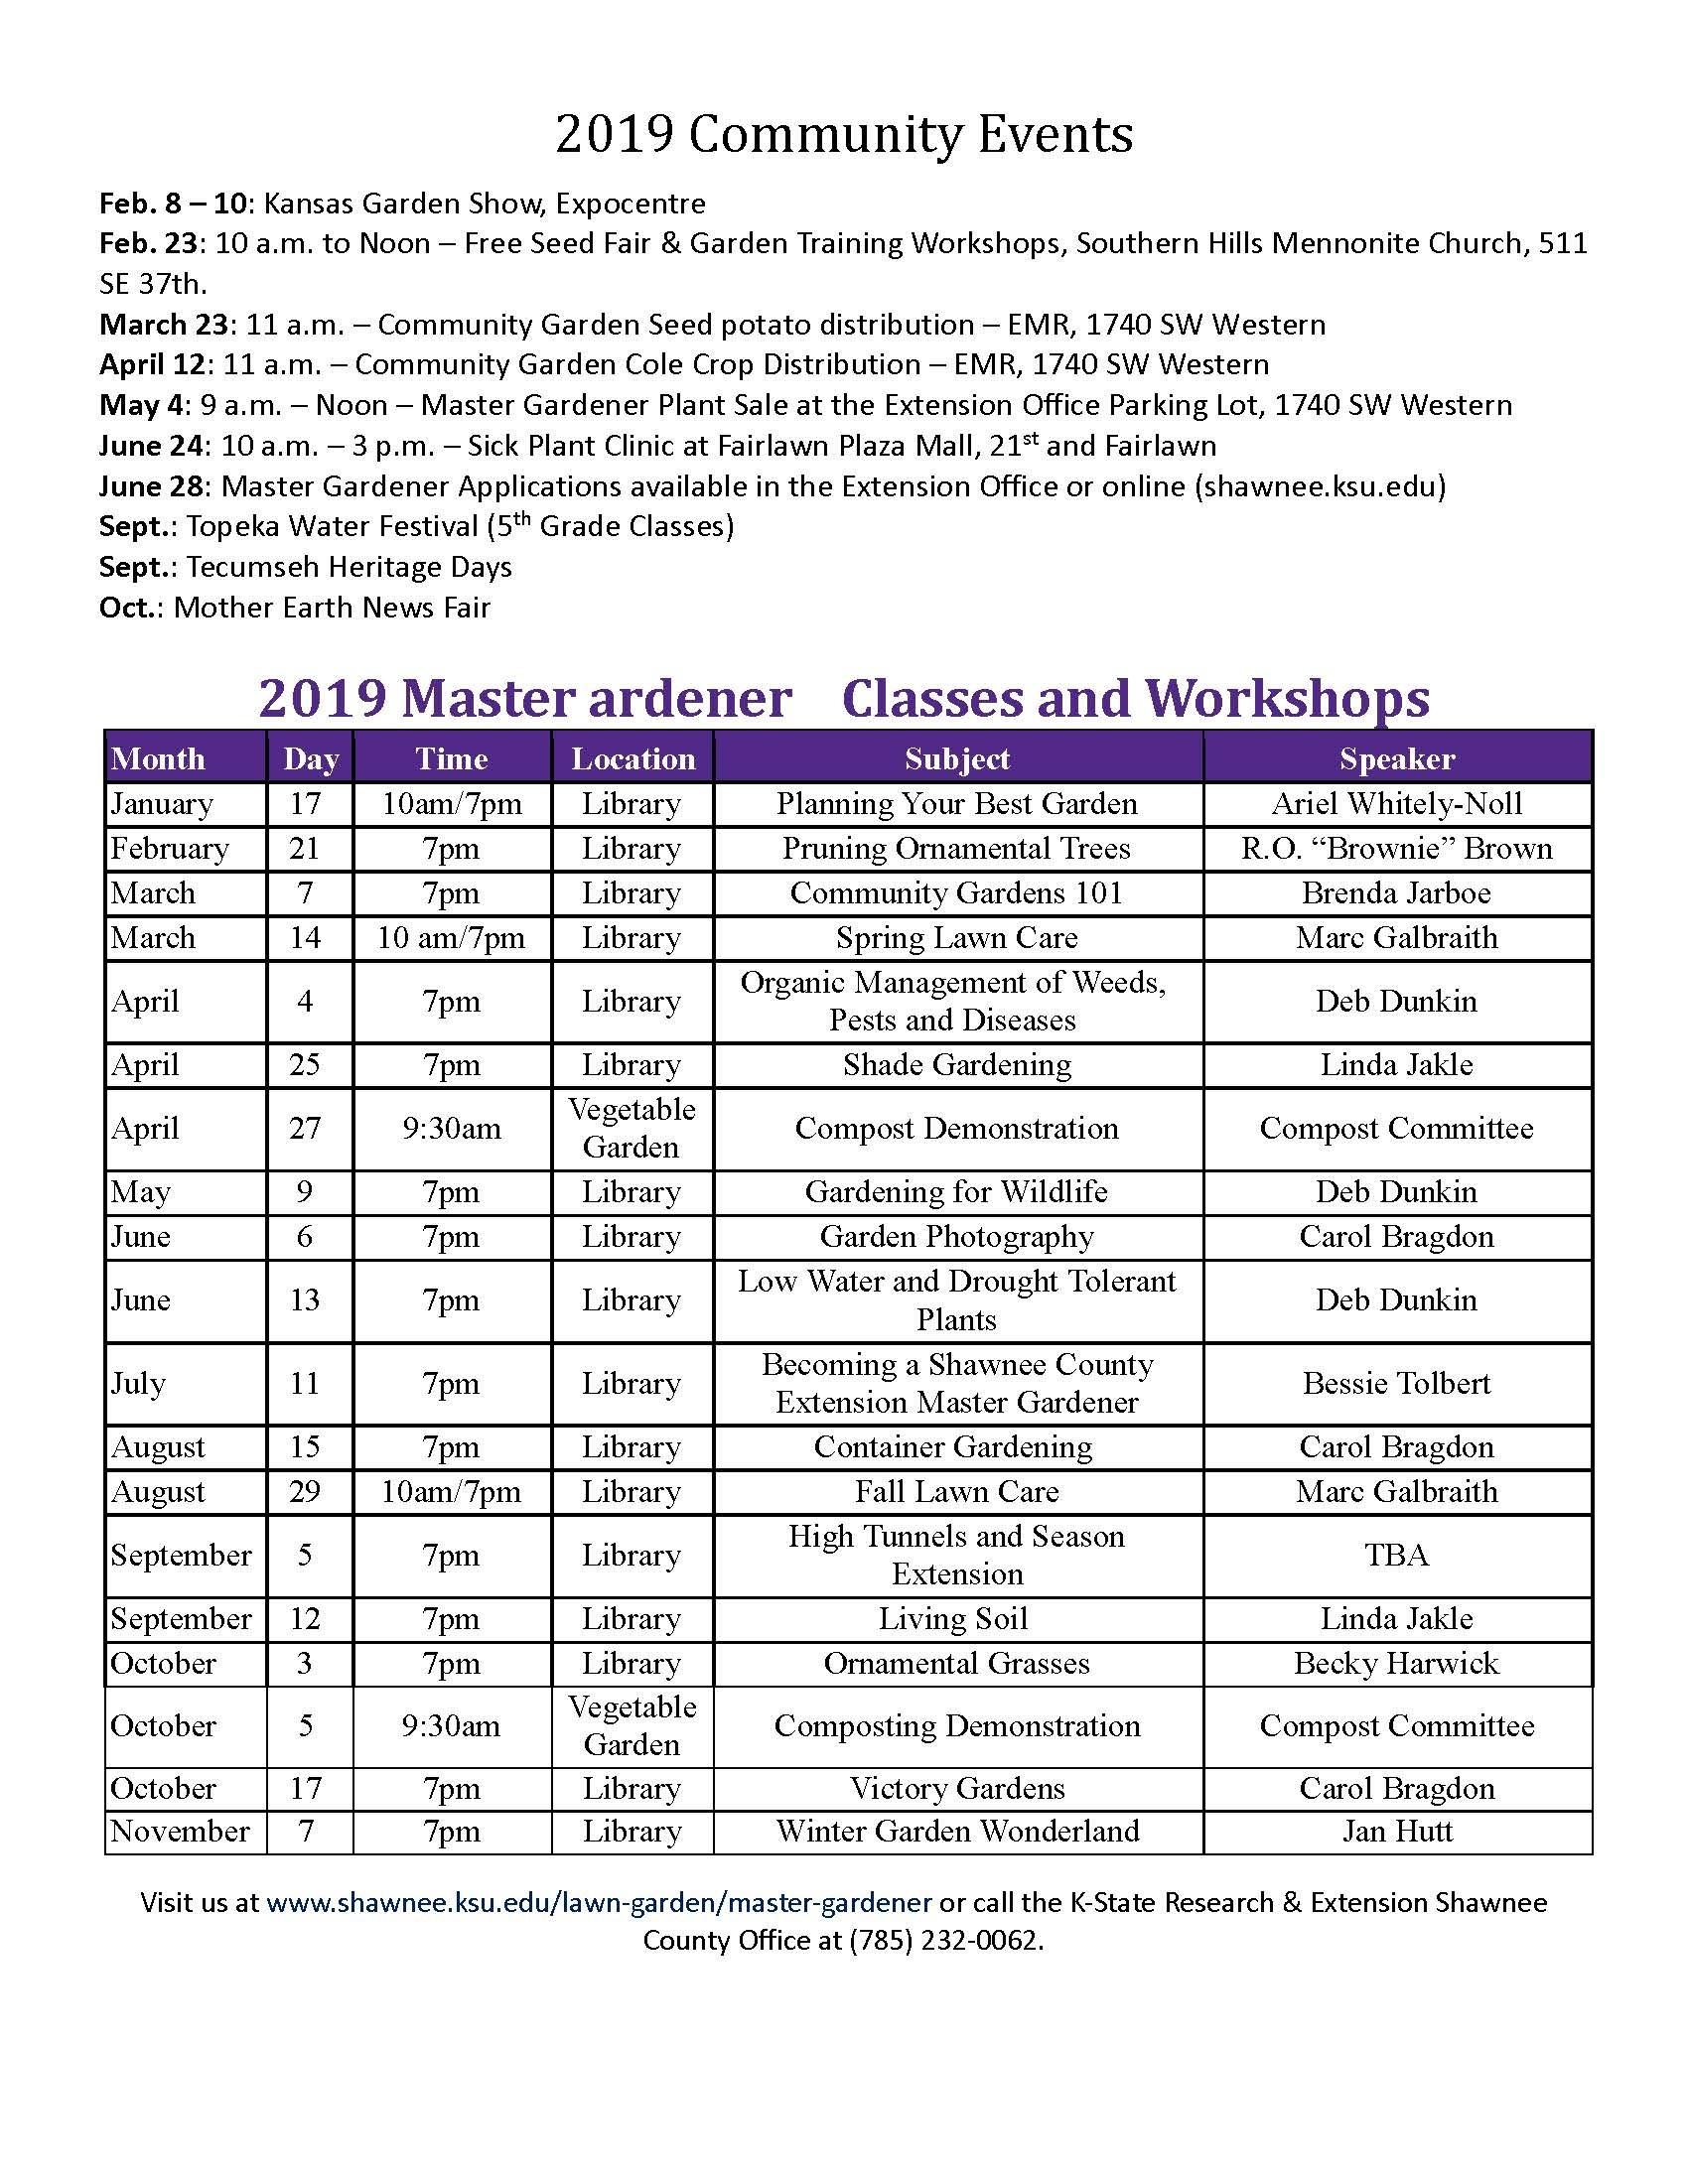 Ksu Spring 2020 Calendar | Free Printable Calendar